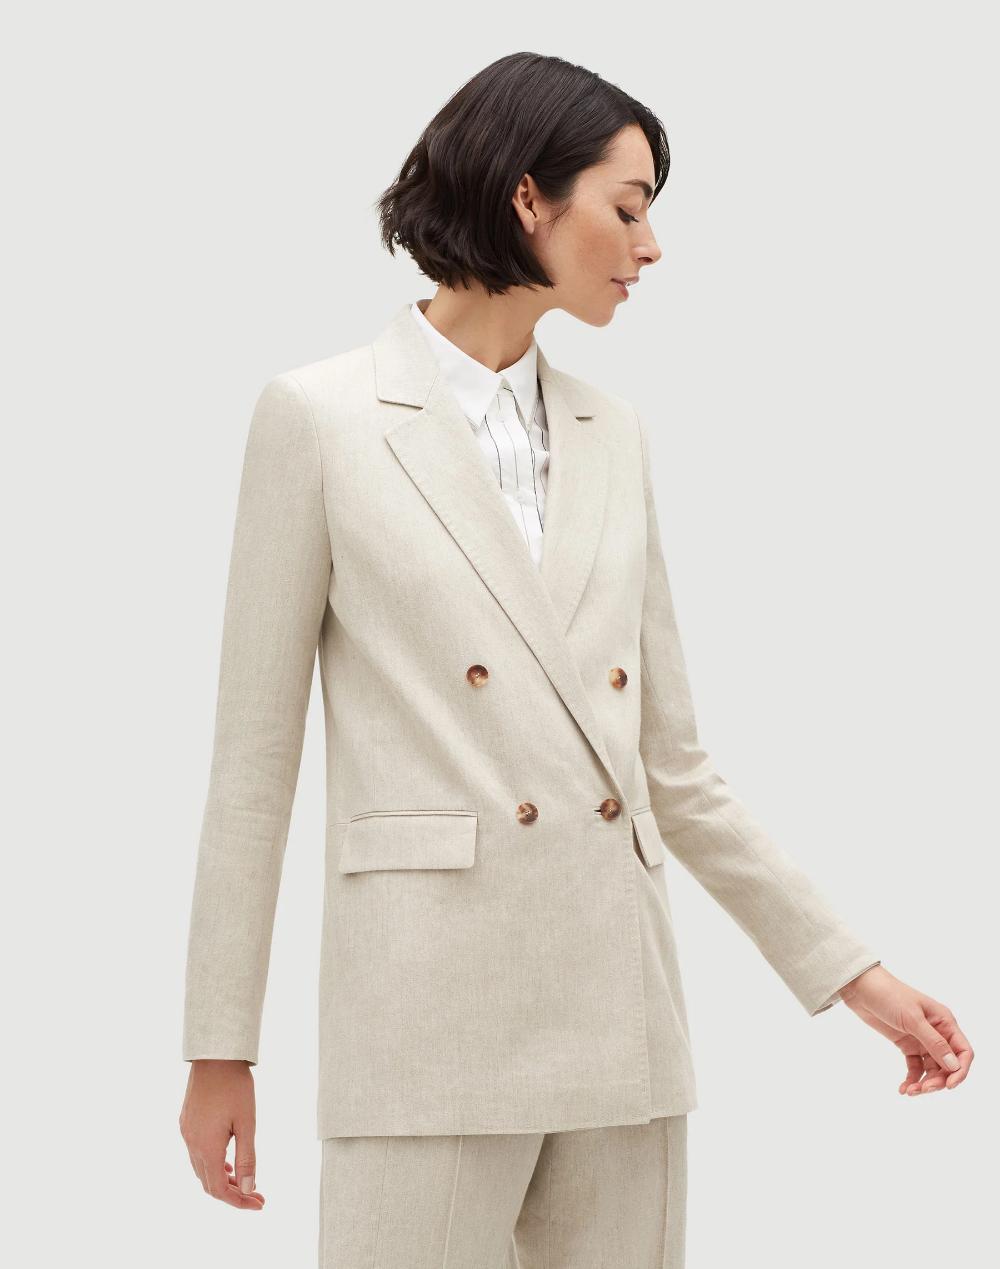 Blazer Suit Modern Ladies Coat Pant Design